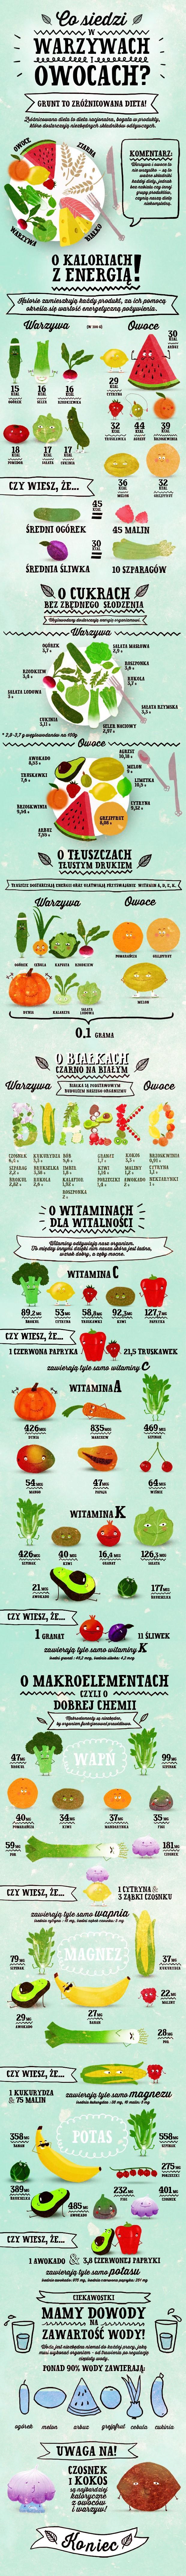 O Owocach I Warzywach Z Kuchni Lidla Na Healthy Food